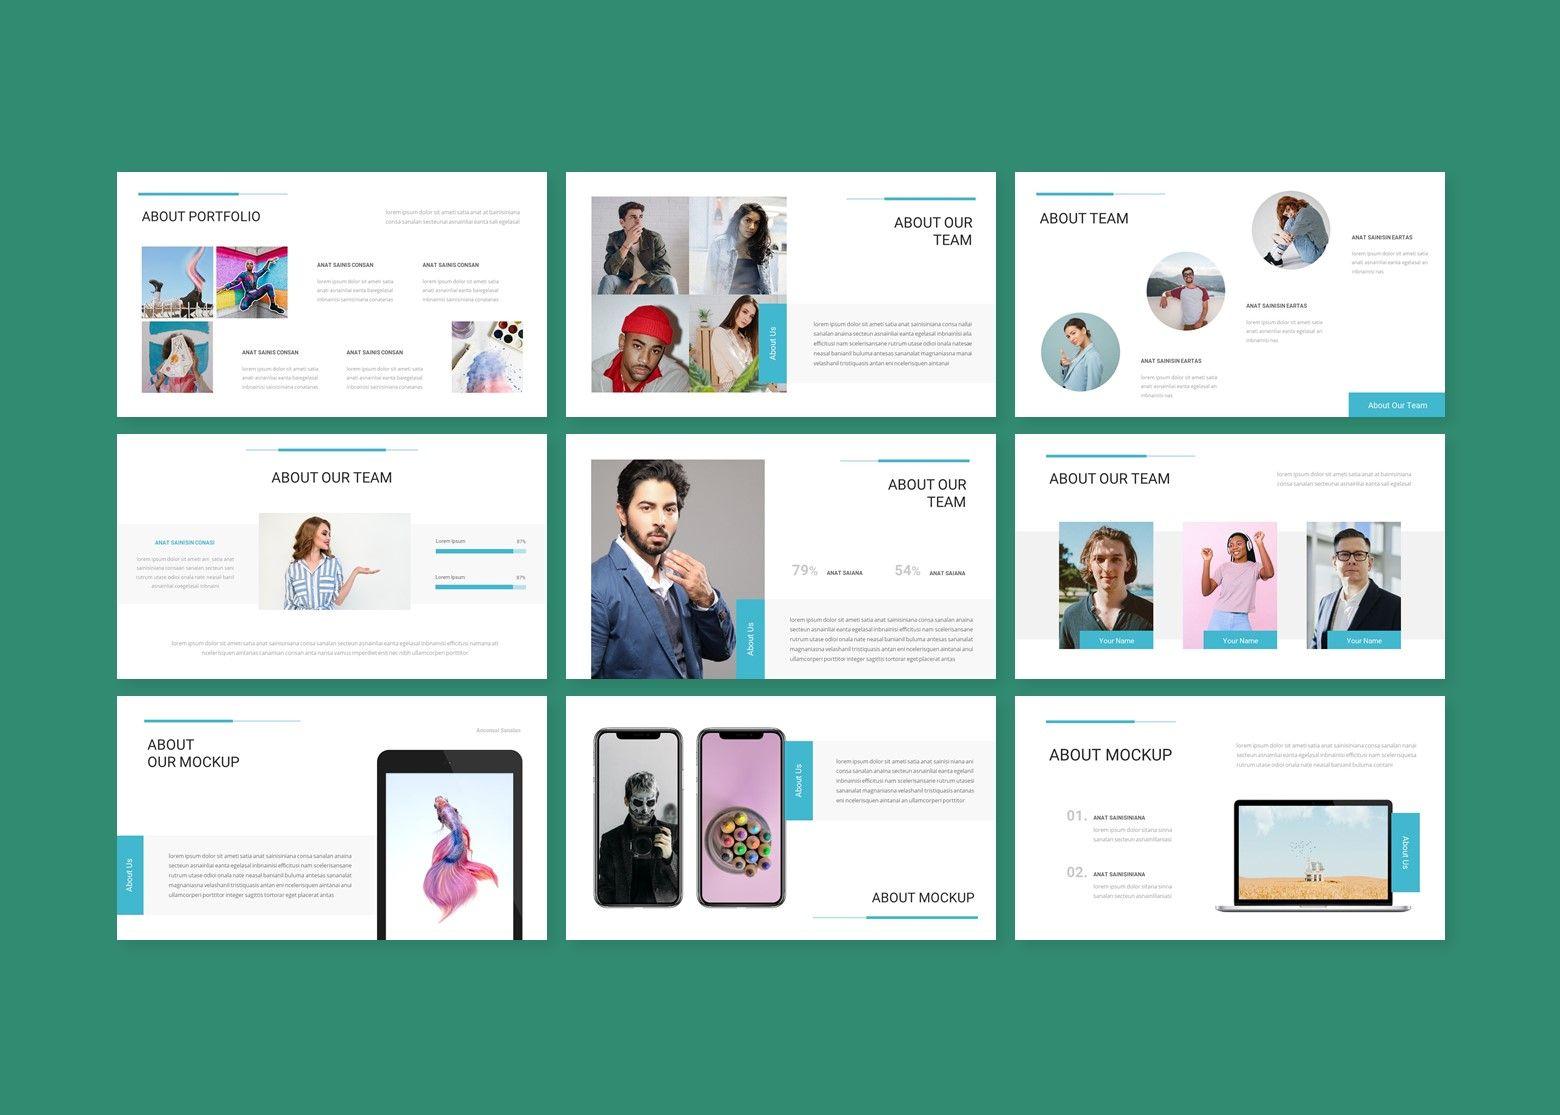 Aion Corporate Google Slides Template, Slide 4, 08151, Business Models — PoweredTemplate.com